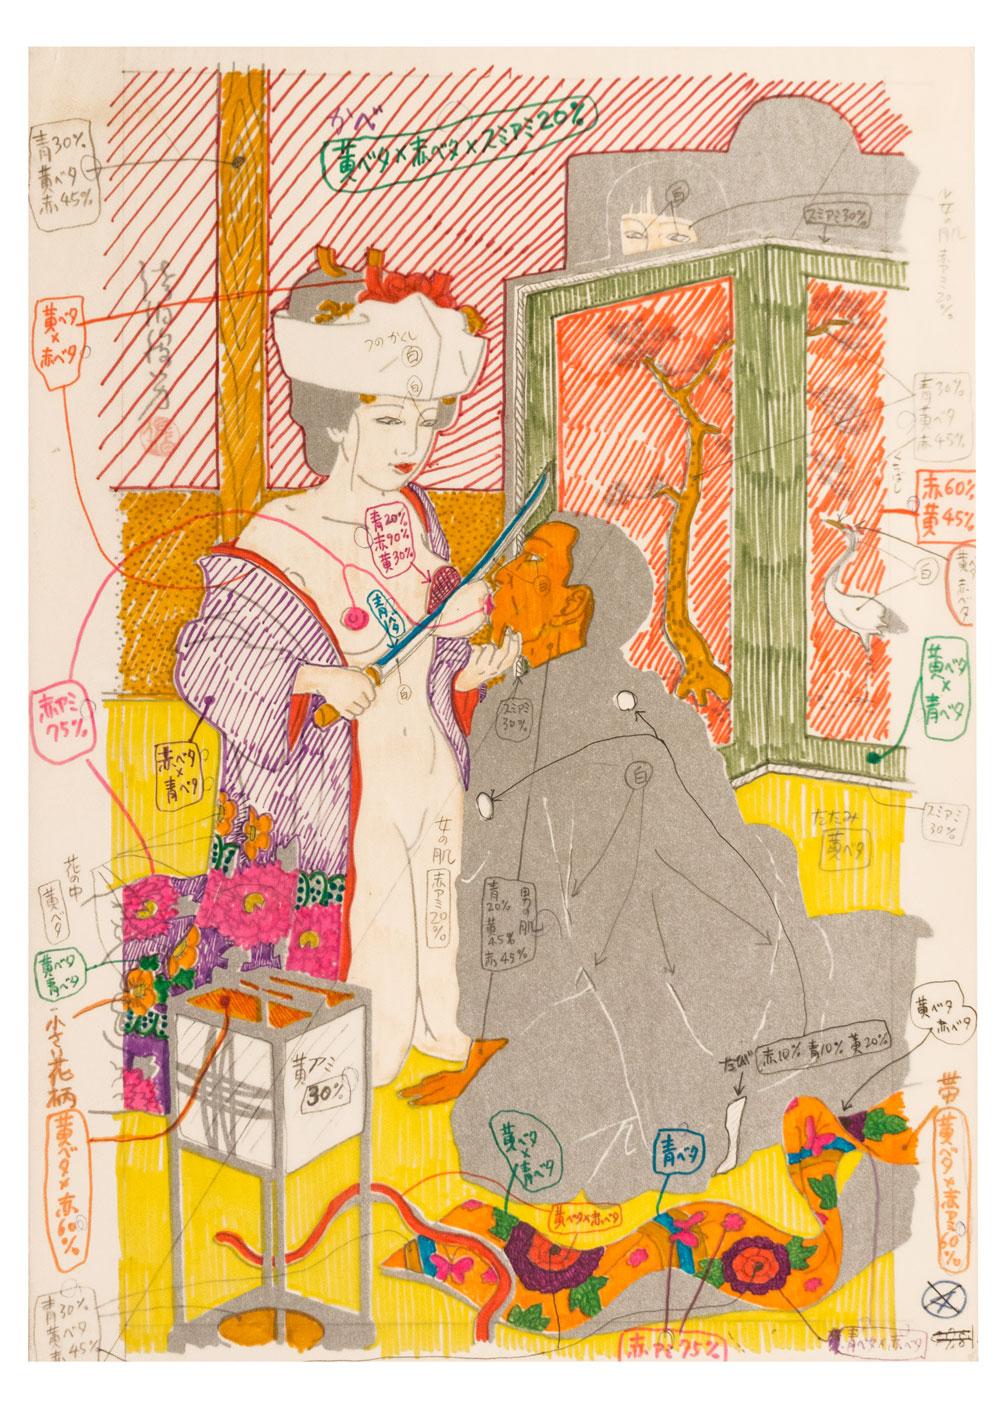 Toshio Saeki Shinen Printer specifications, ink on vellum